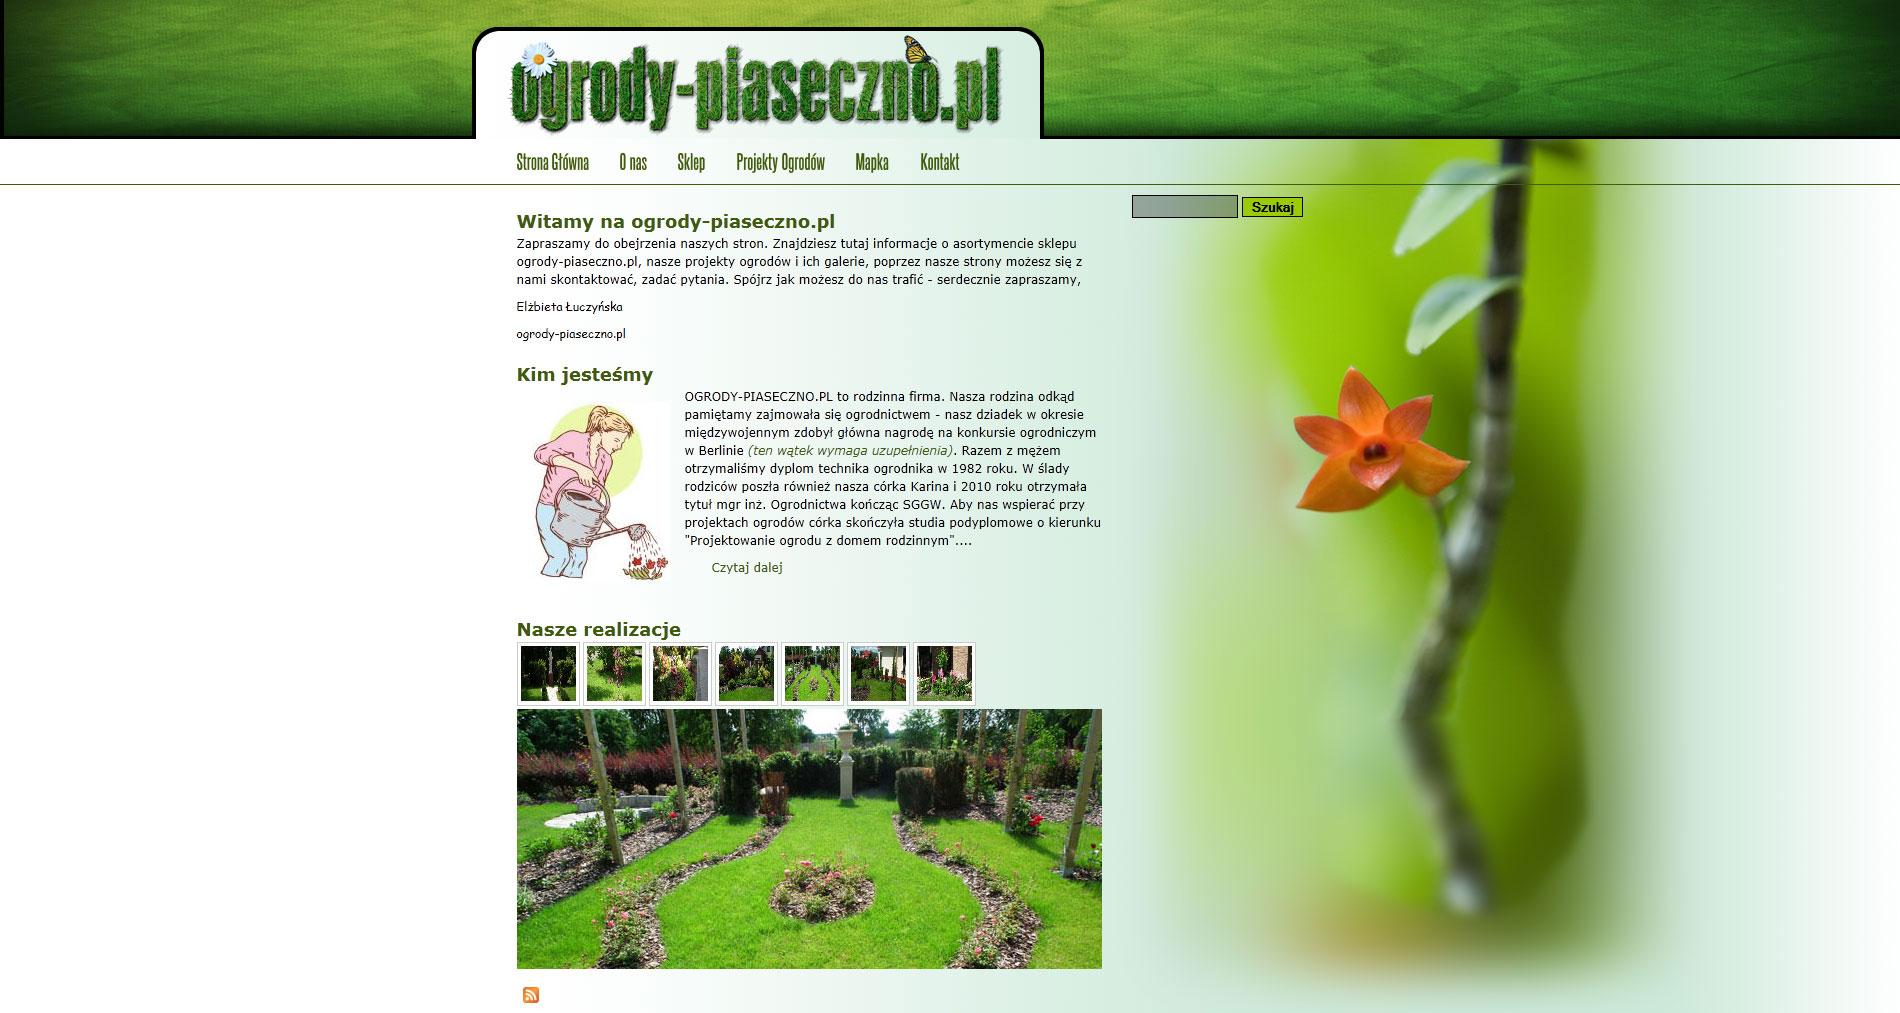 Ogrody-piaseczno.pl